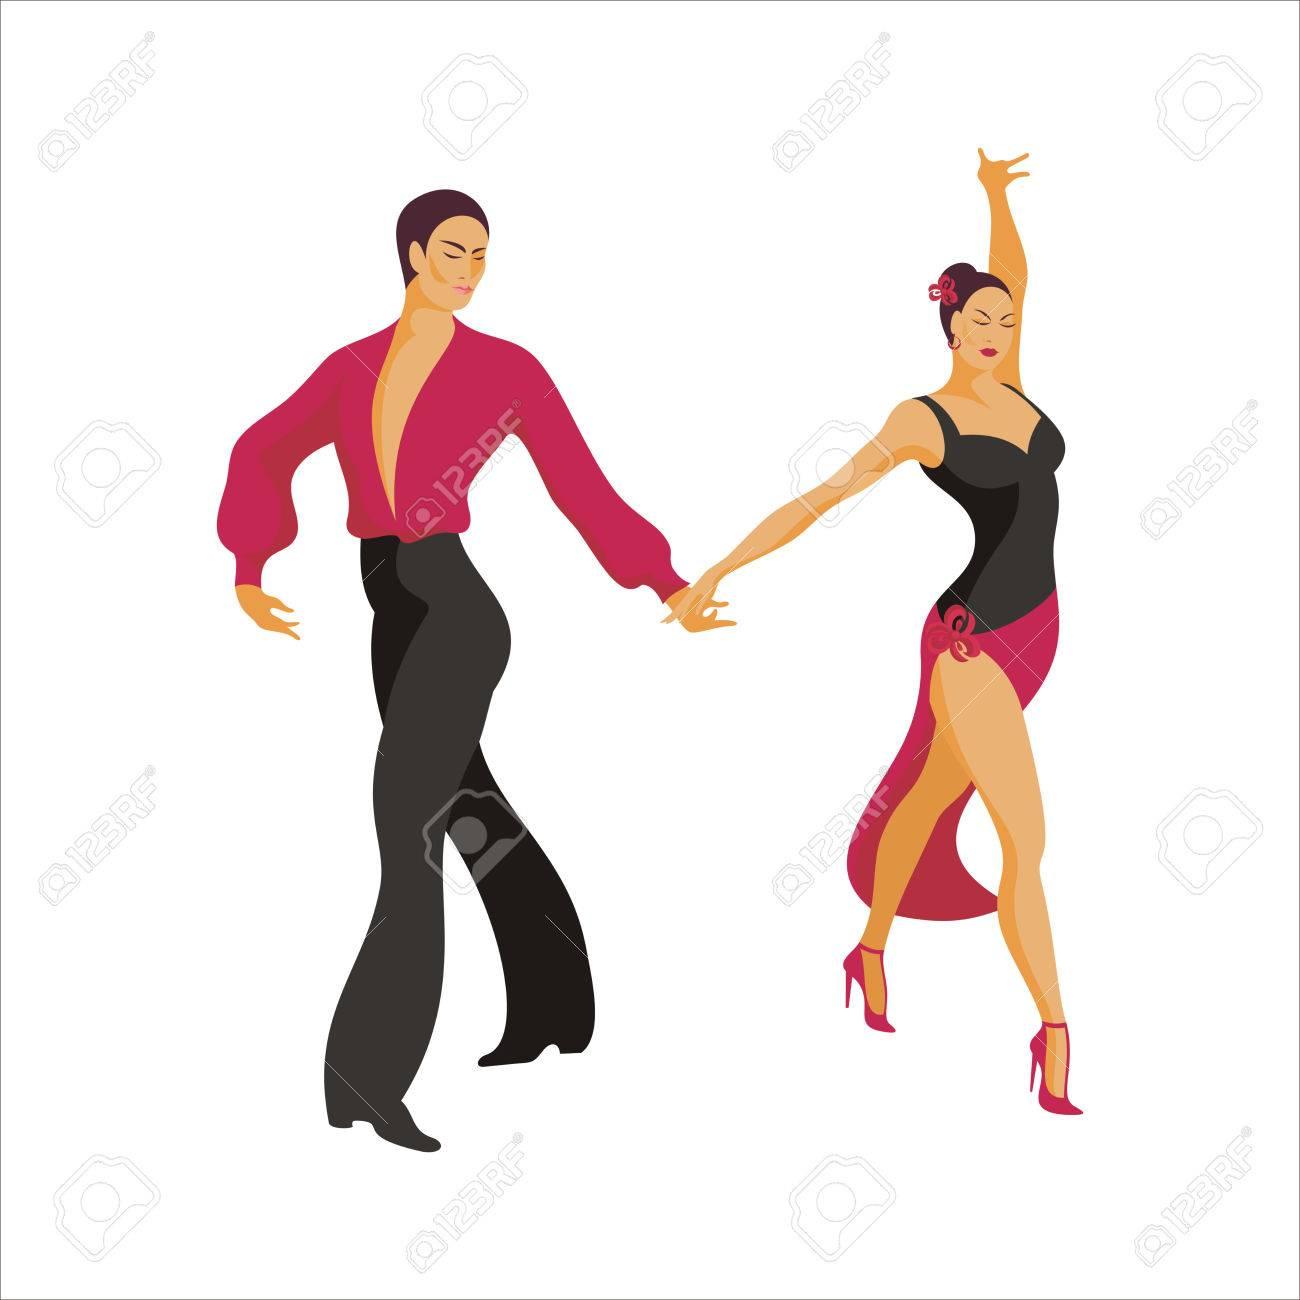 Svært Spanish Dance Paso Doble. Ballroom Dancing Couple Royalty Free KG-64